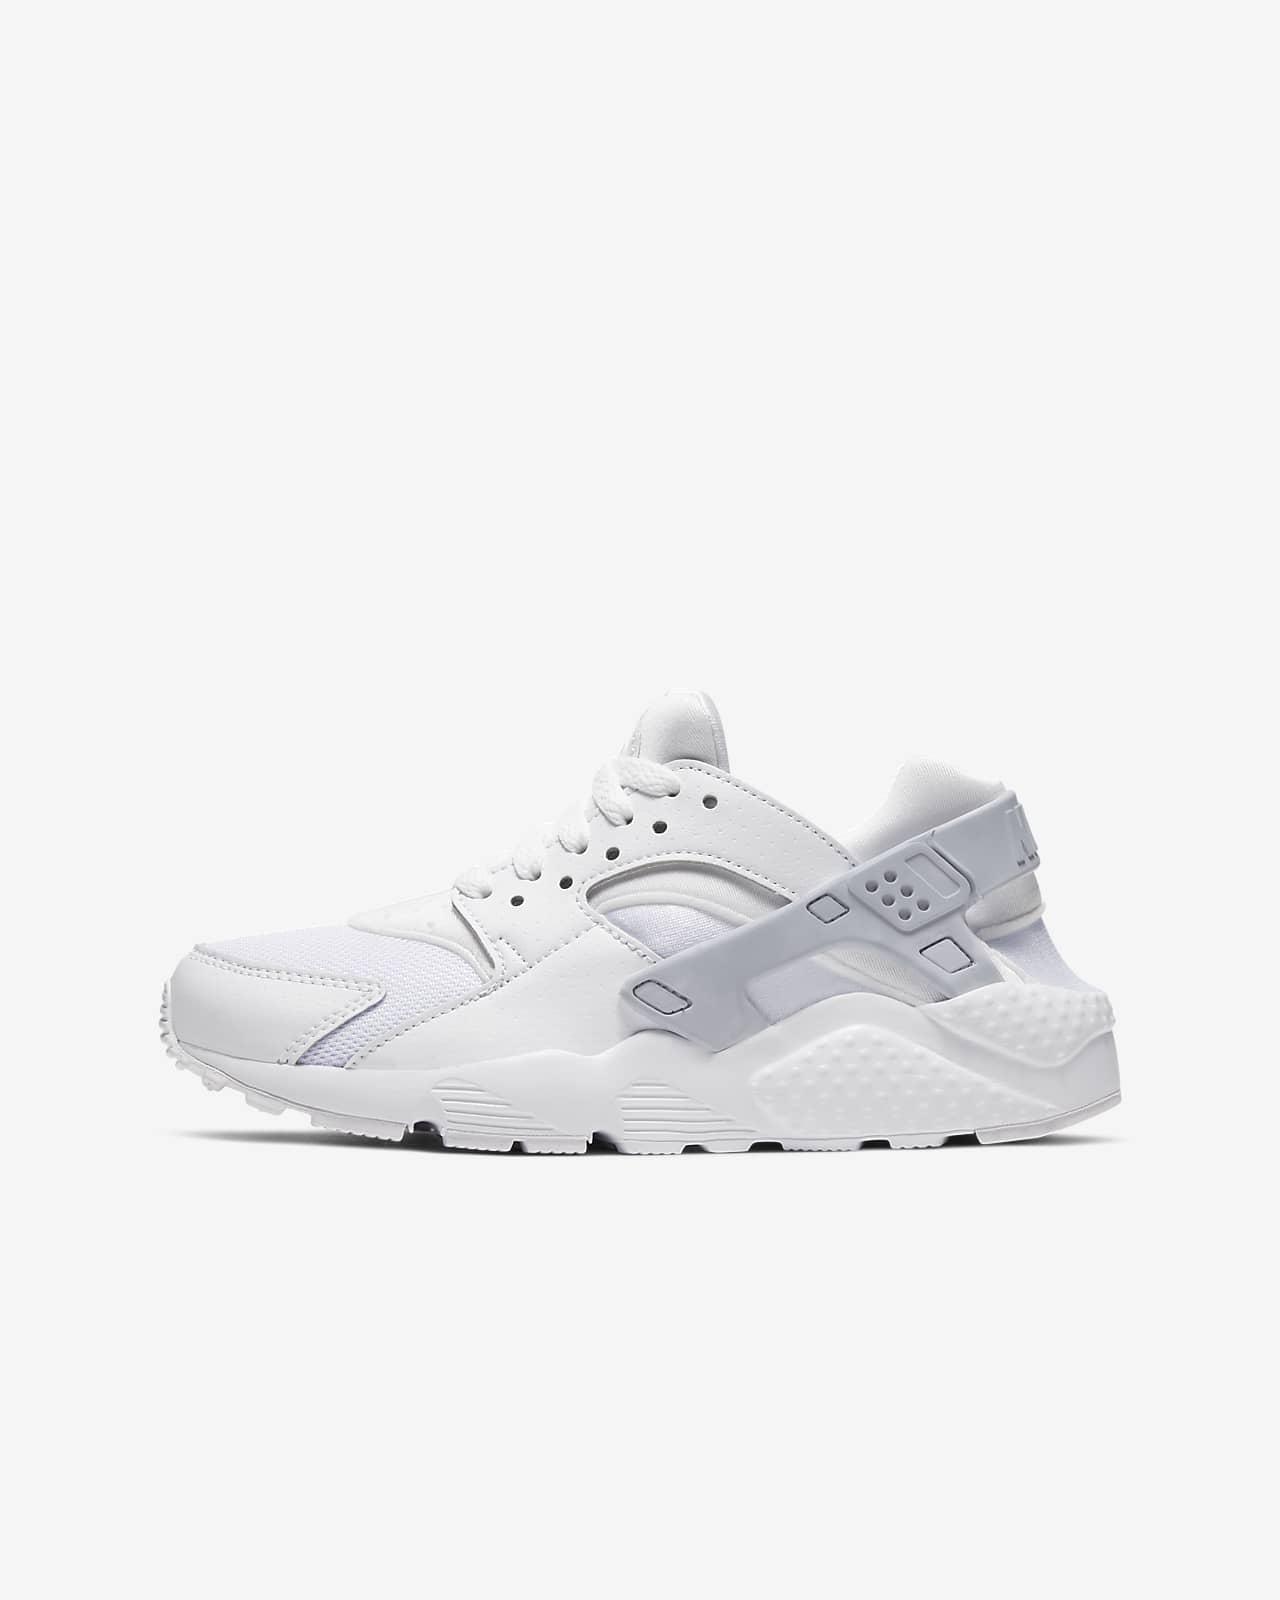 Iluminar lobo liberal  Calzado para niños talla grande Nike Huarache Run. Nike.com